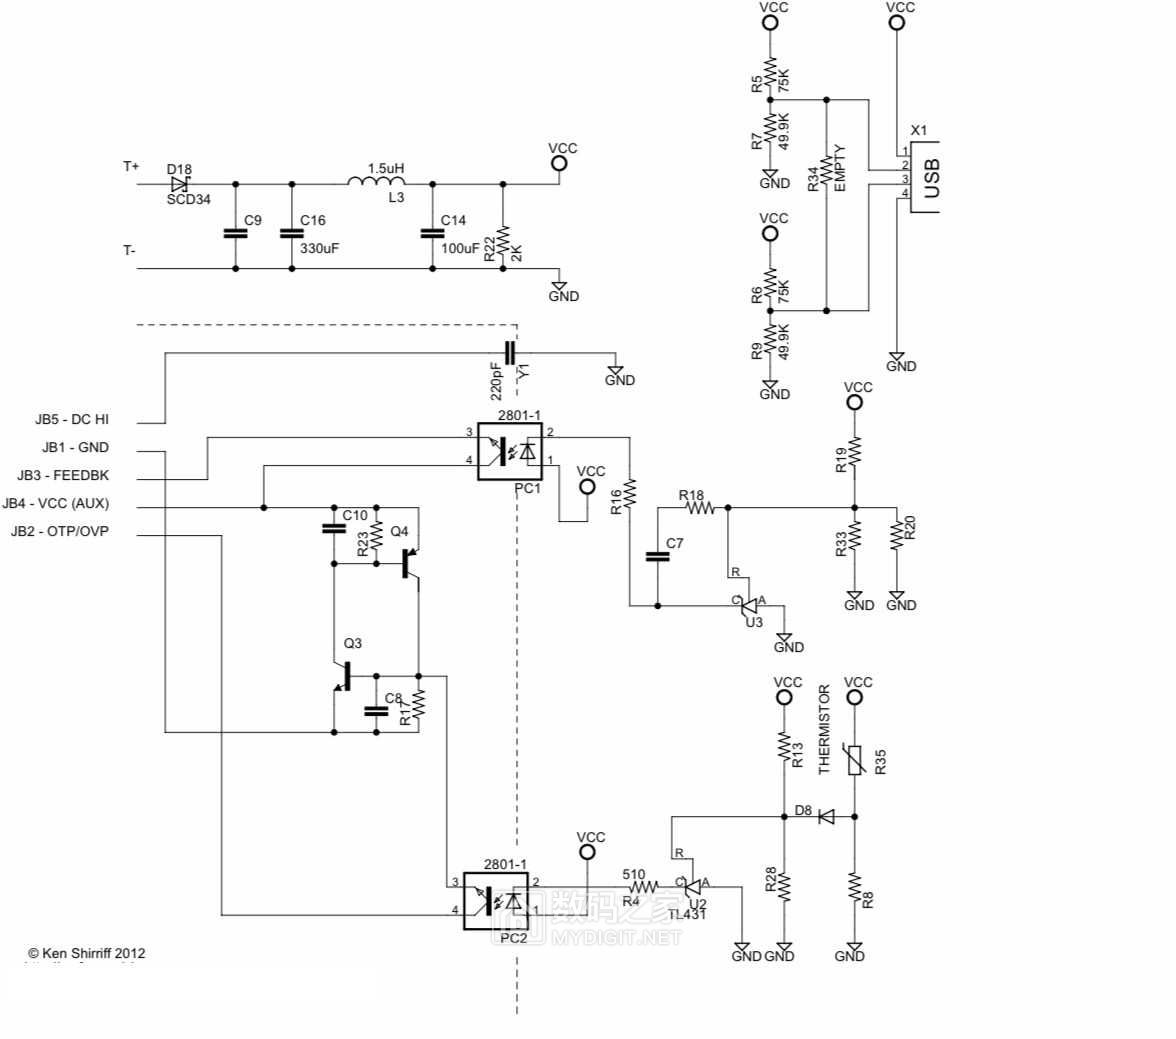 26C88AD0-3B16-4F3F-B373-691A1CD0752A.jpeg